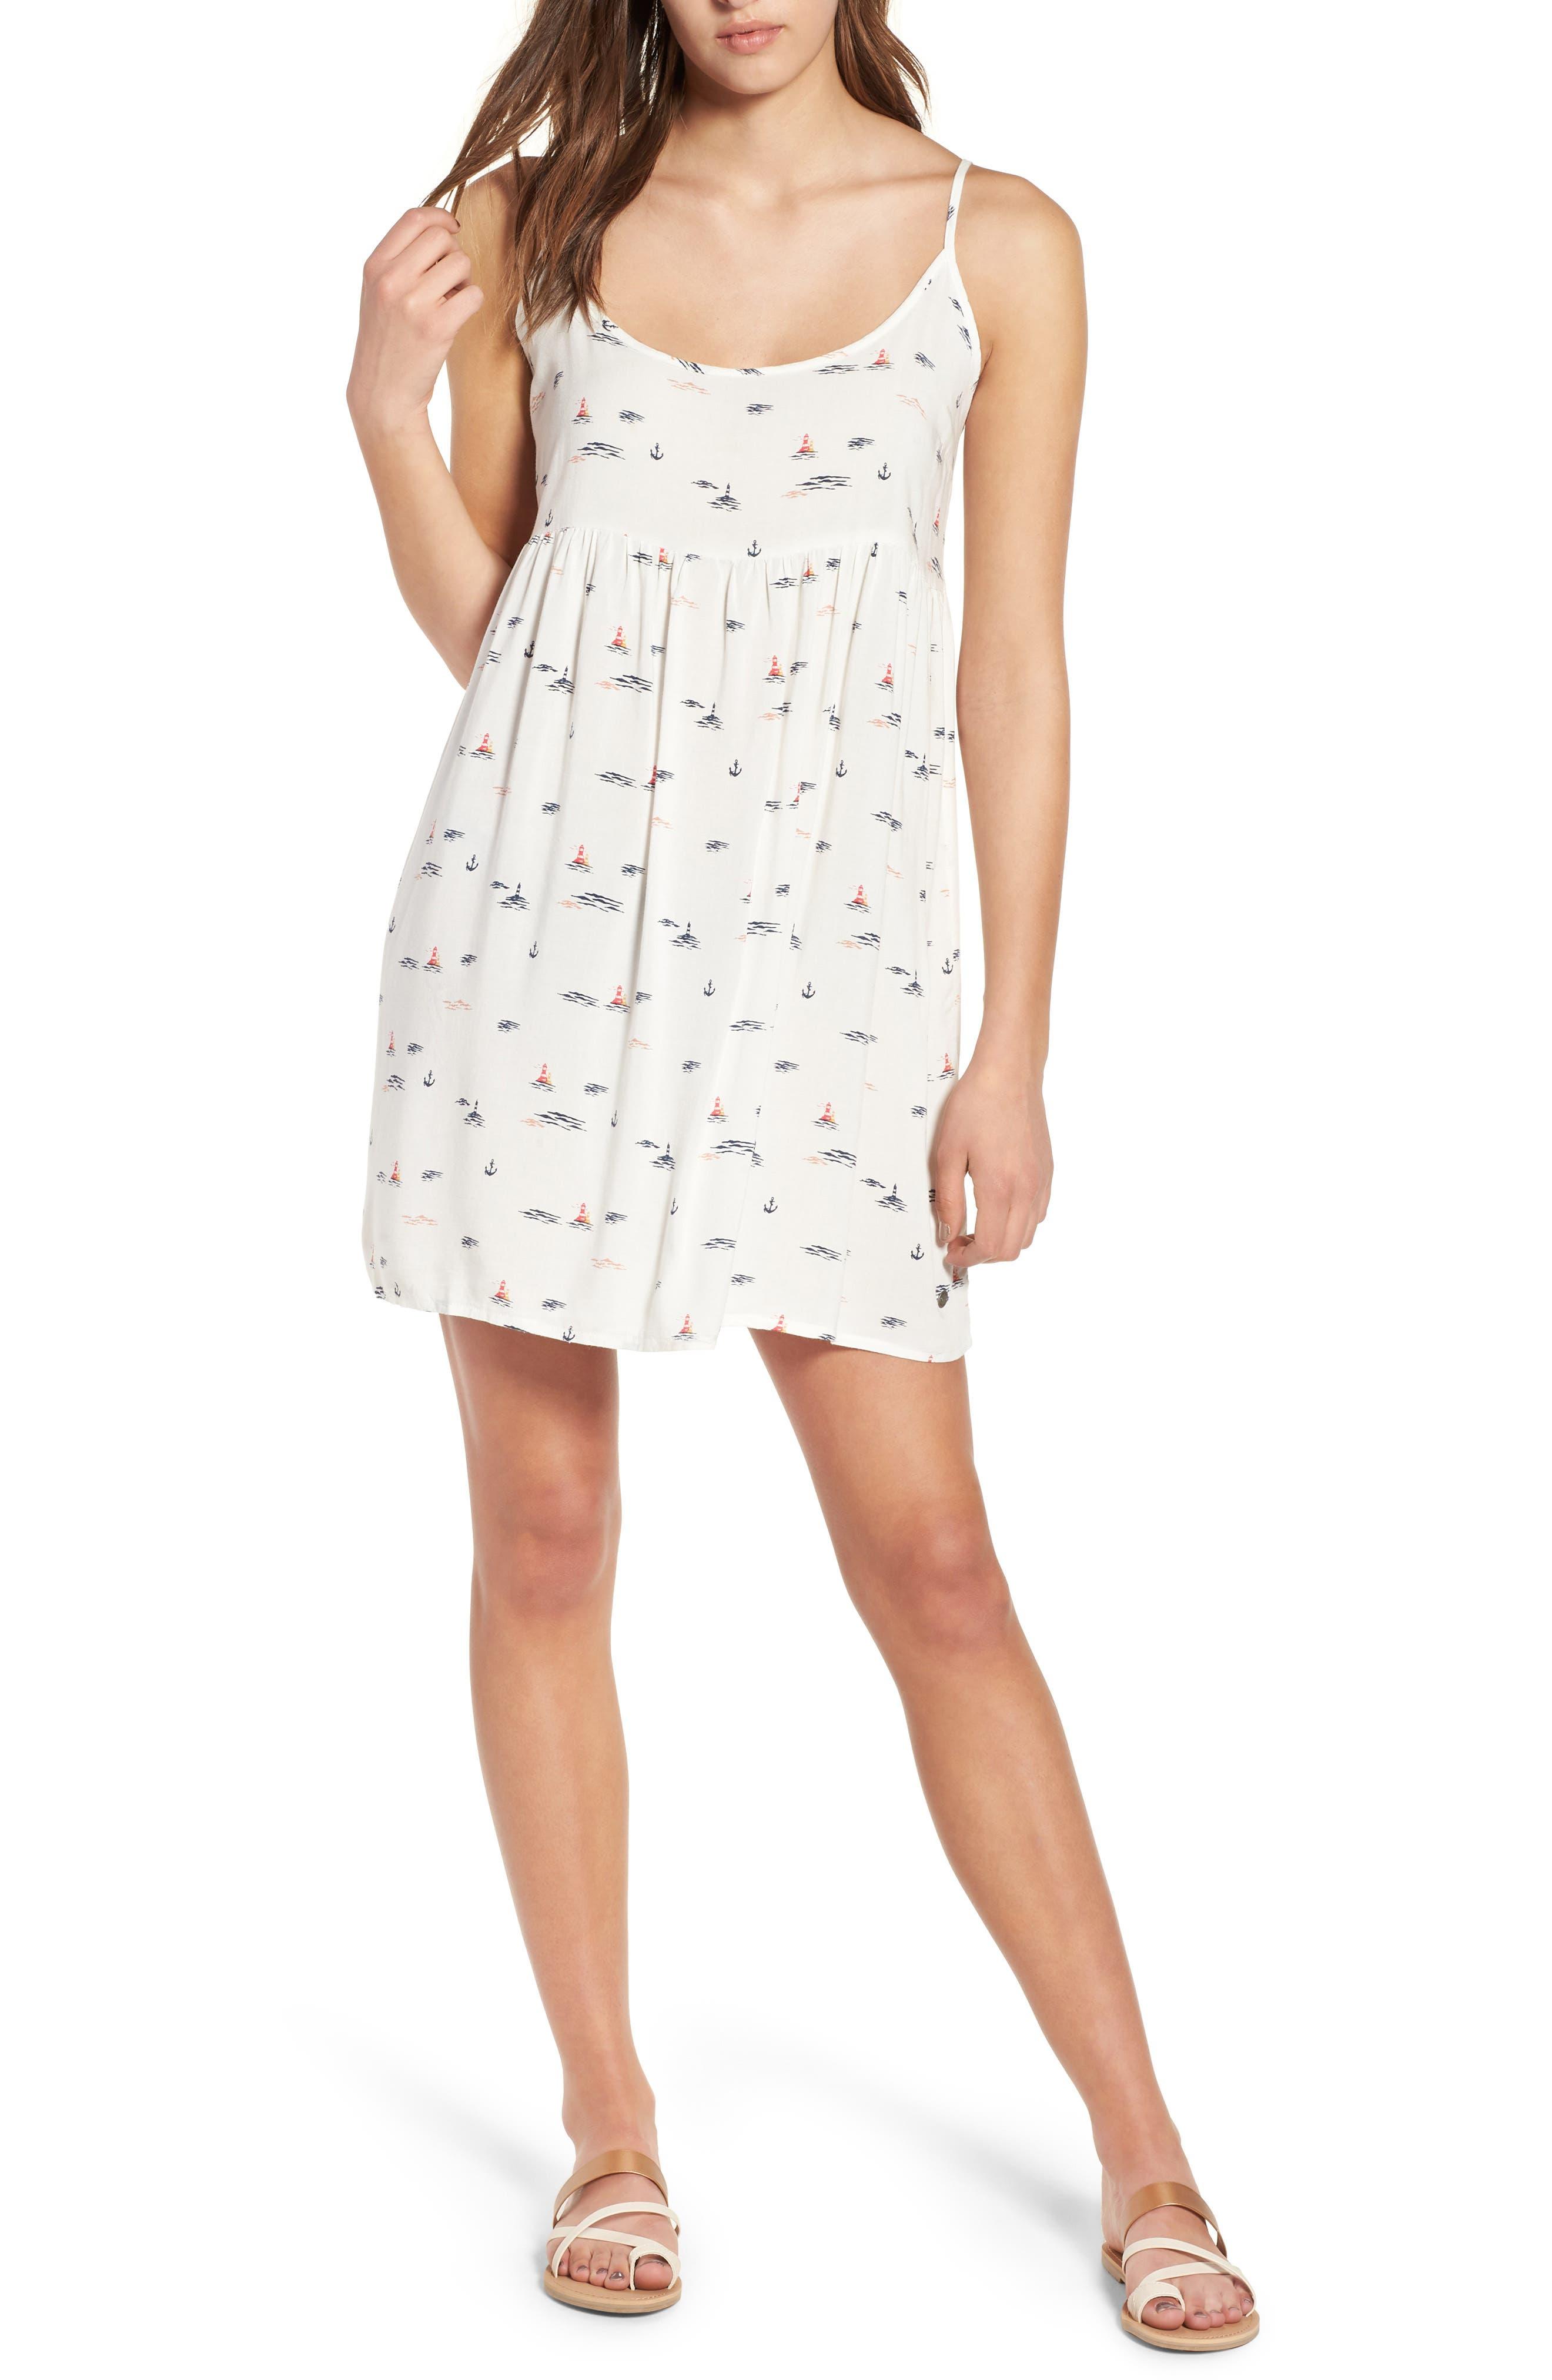 Roxy Tropical Sundance Print Babydoll Dress